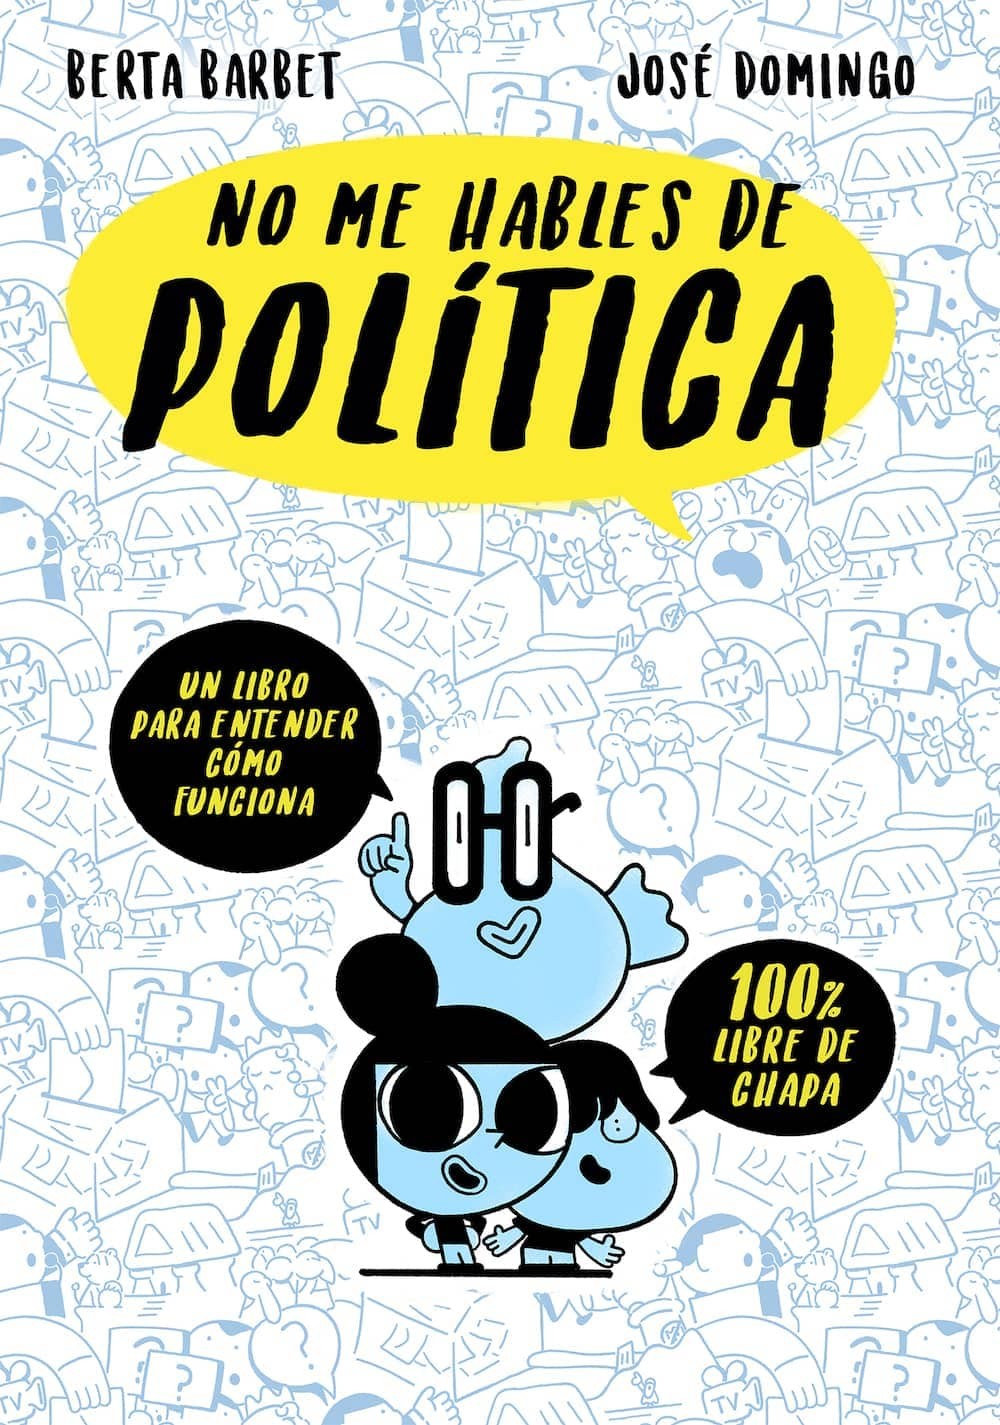 NO ME HABLES DE POLITICA